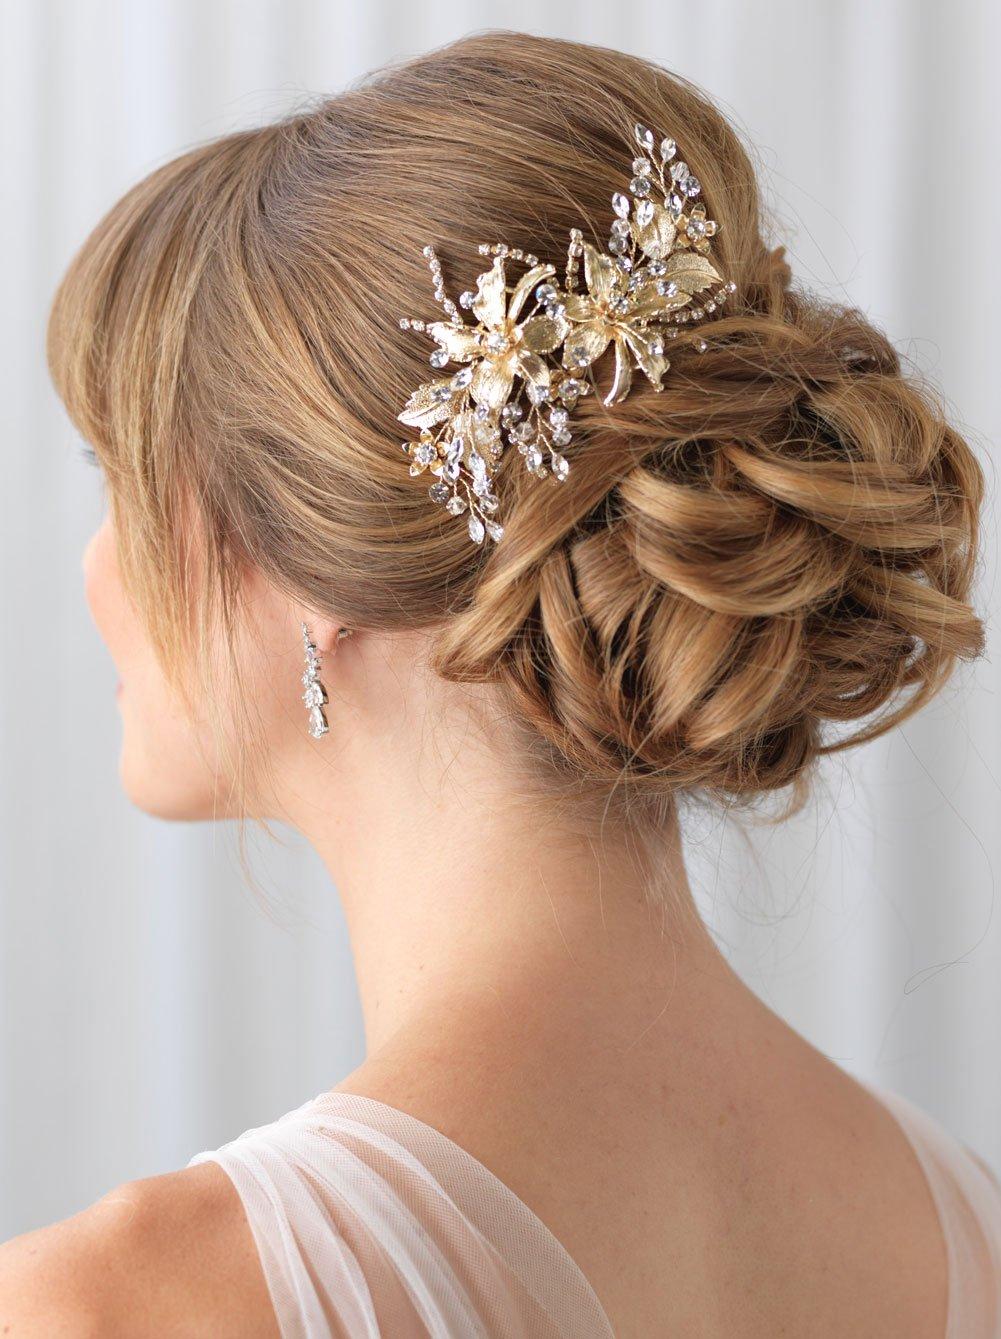 USABride Bridal Comb Gold-Plated Floral Wedding Headpiece Rhinestones Crystals Hair Clip TC-2288-G (Gold)